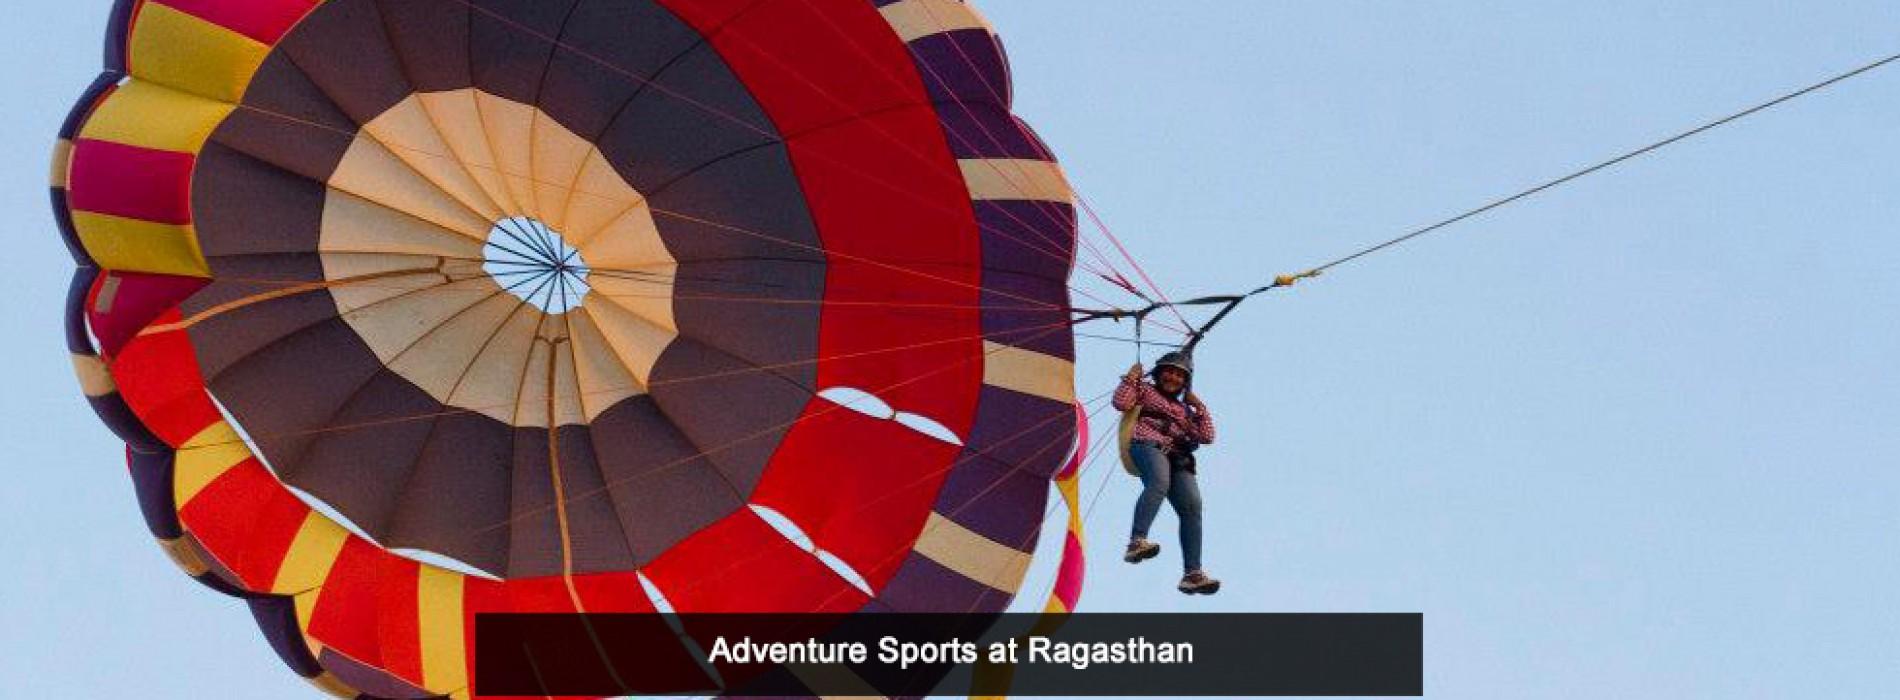 Ragasthan, Where You Unbelong